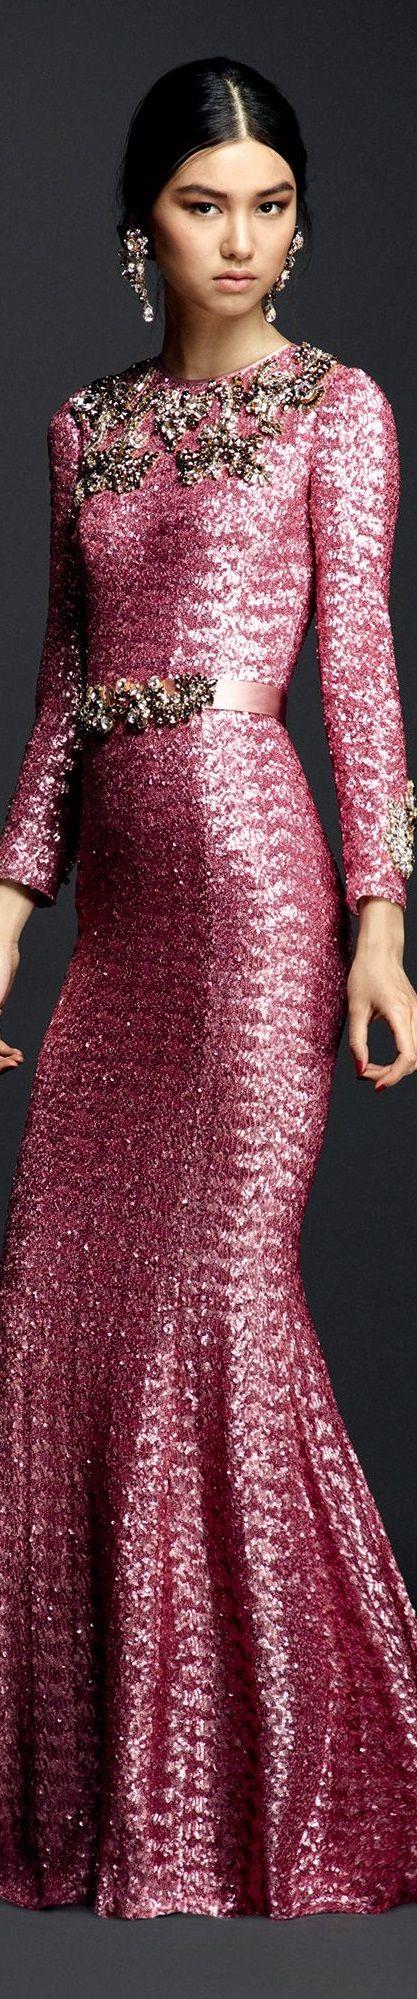 Pink:  #Pink Gown ~ Dolce & Gabbana, Summer 2016.